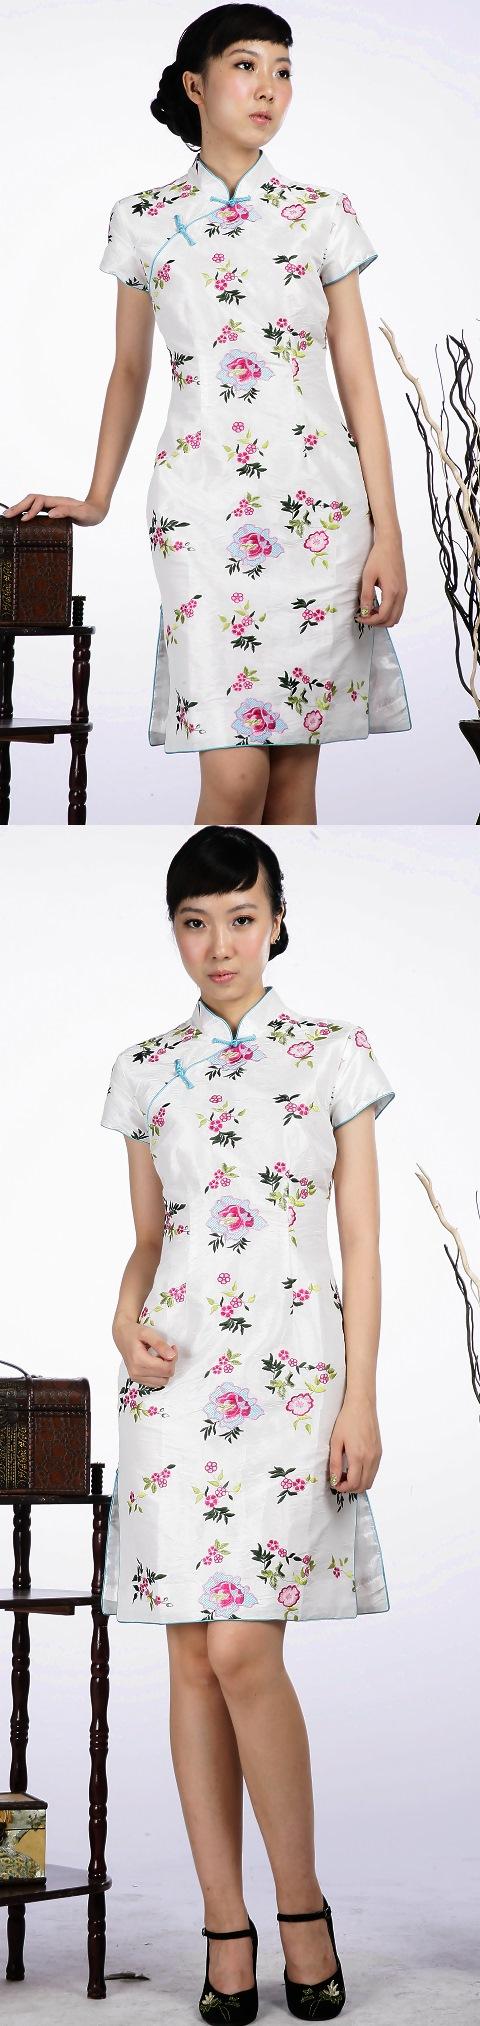 Short-sleeve Floral Embroidery Midi Cheongsam Dress (White)